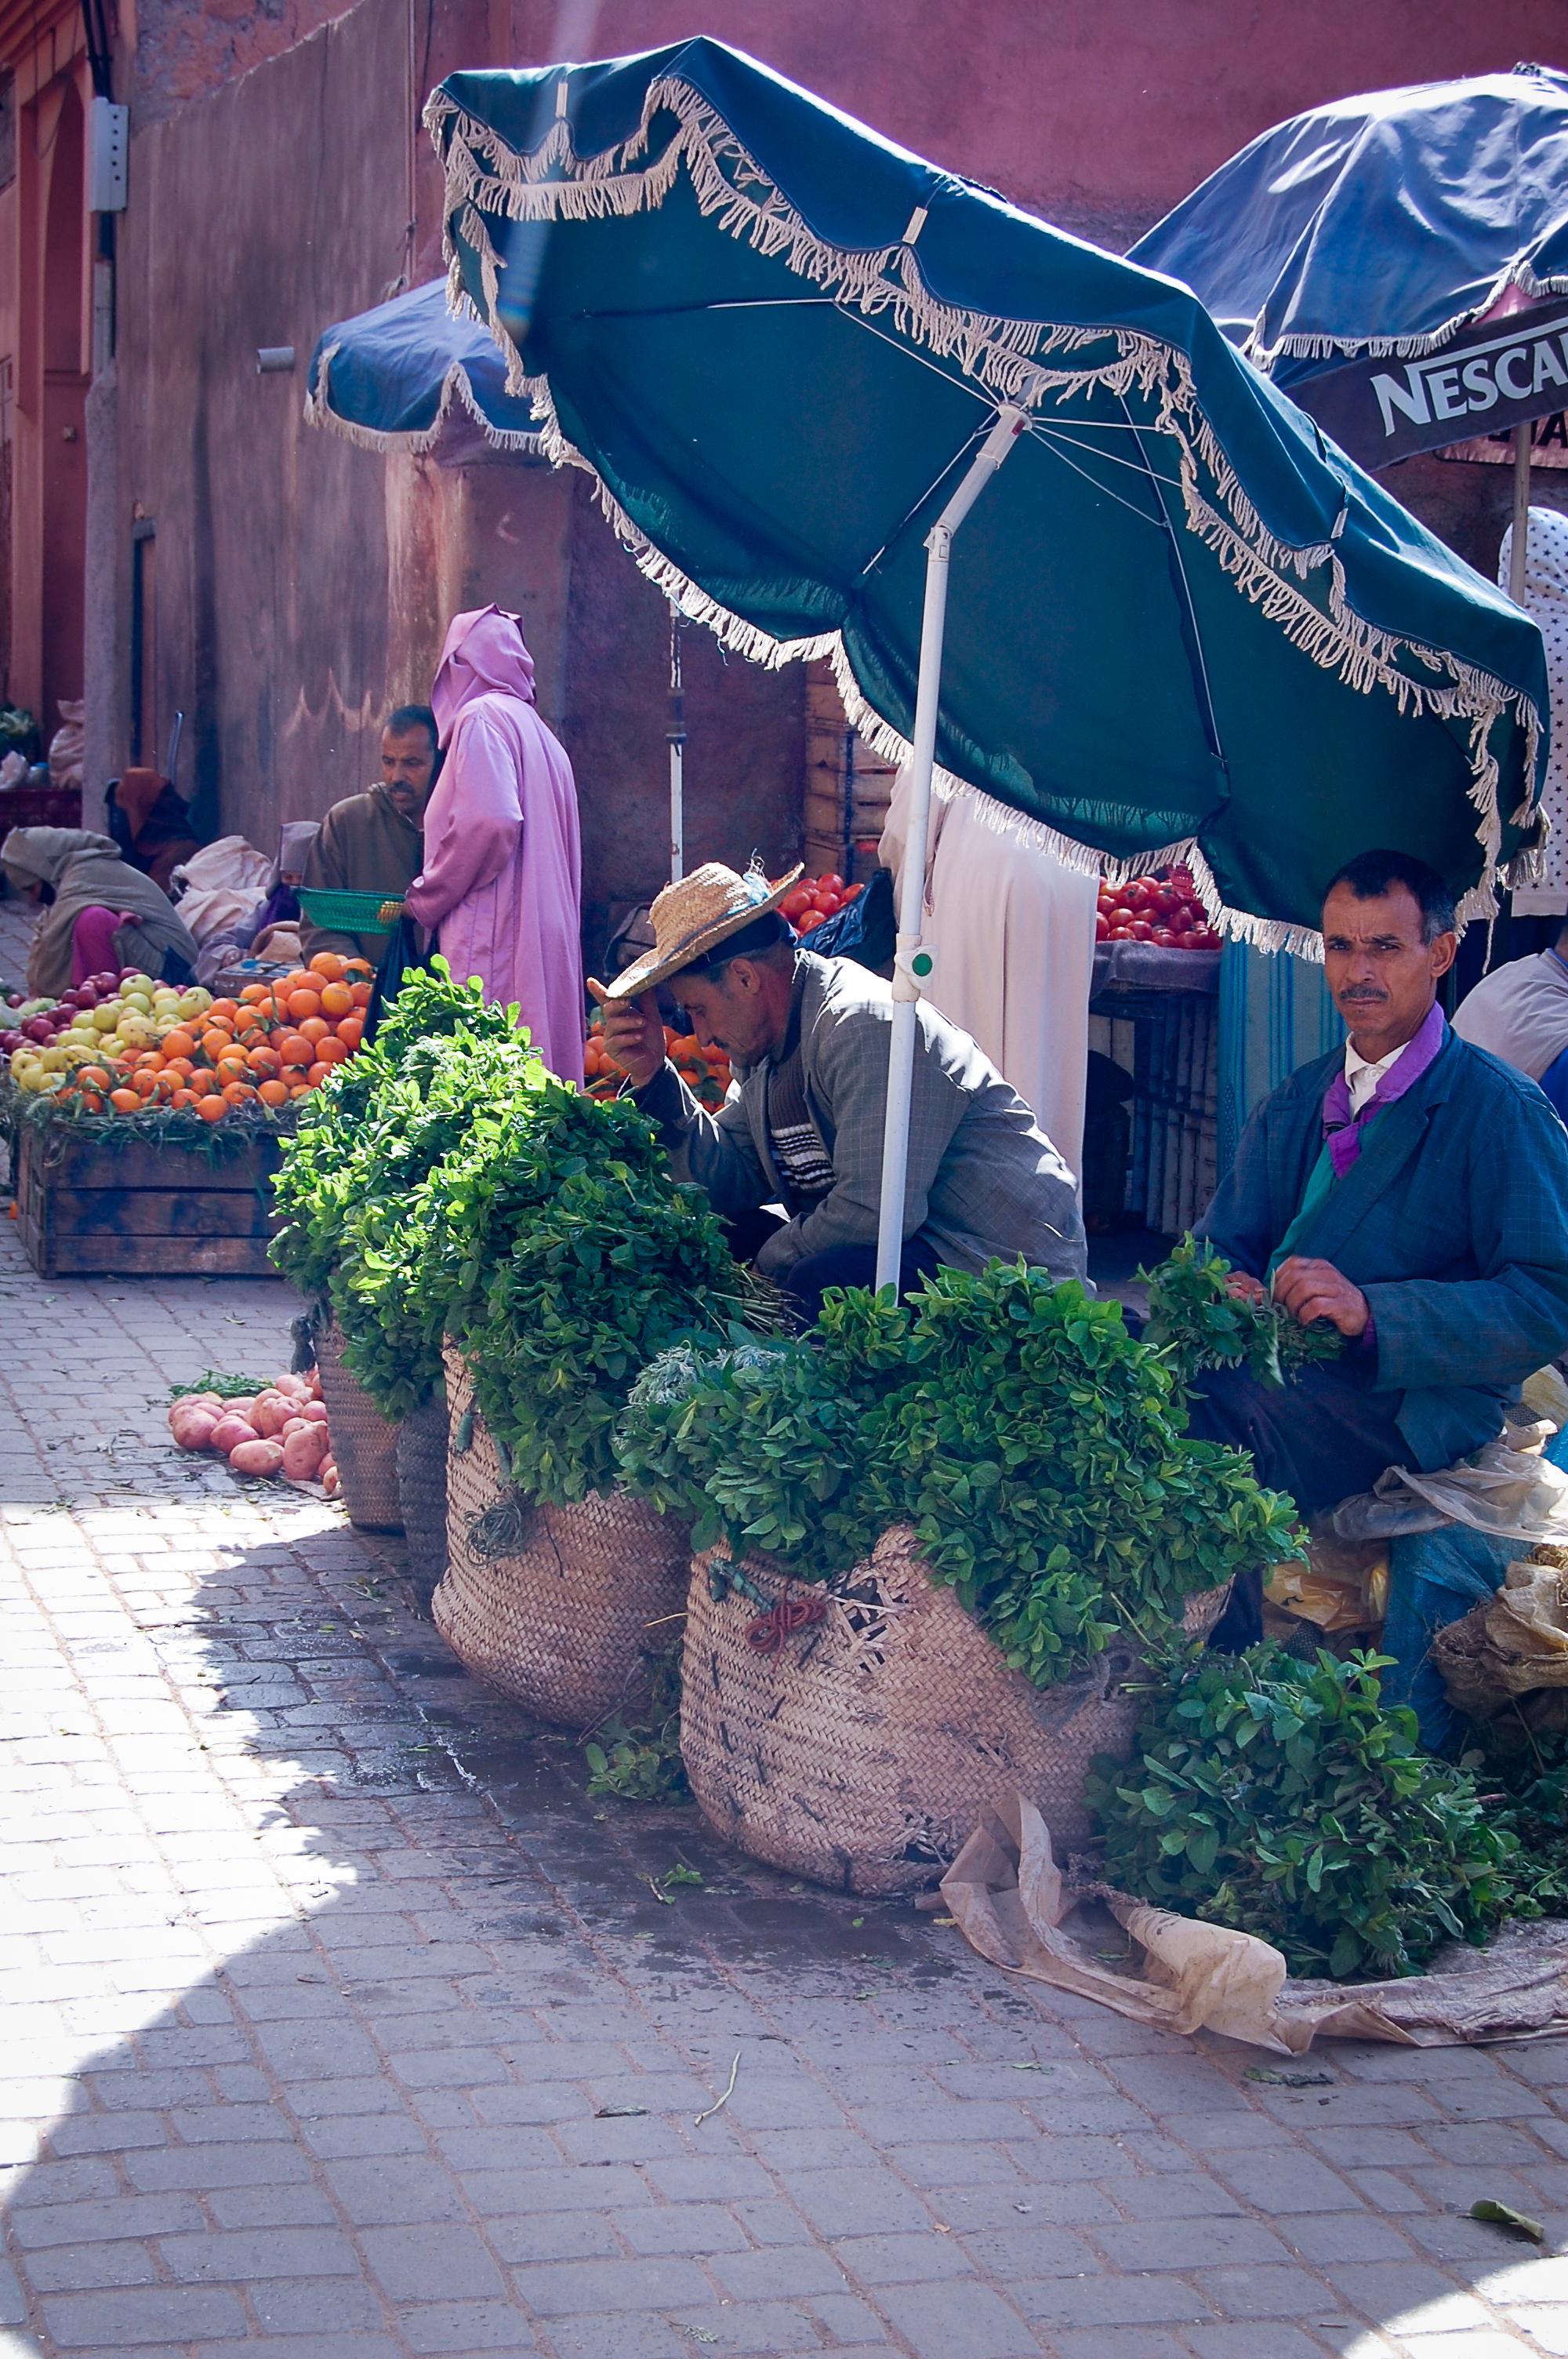 morocco (15 of 39).jpg